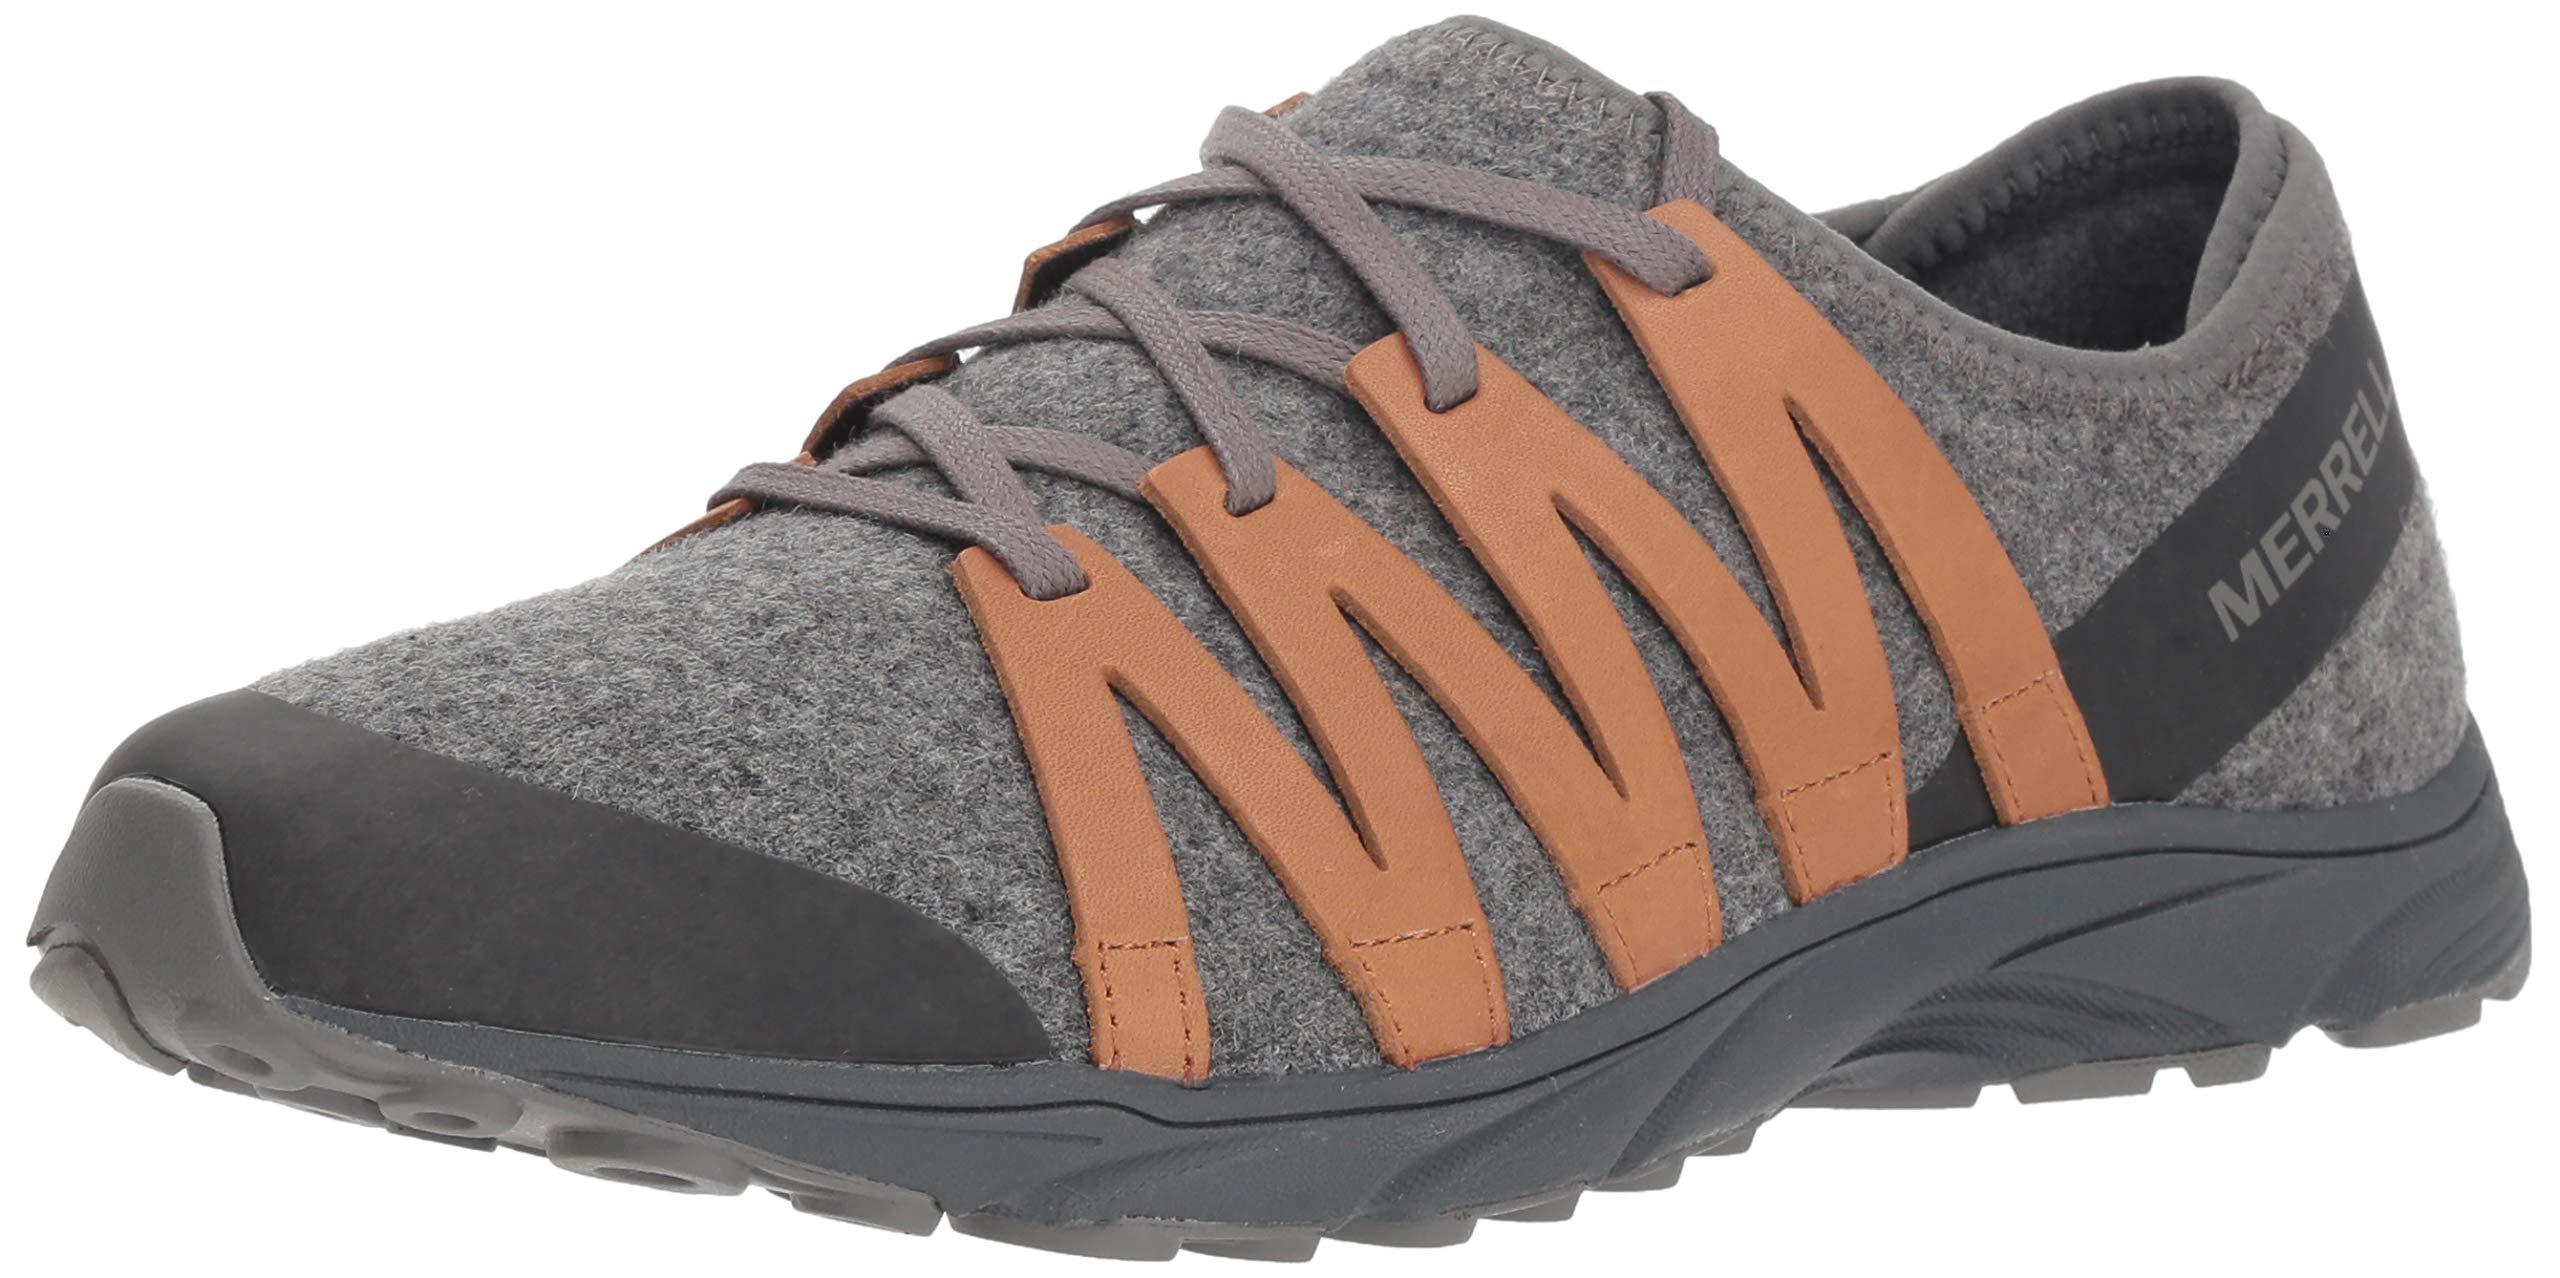 Merrell Women's Riveter Wool Sneaker Charcoal 11 M US